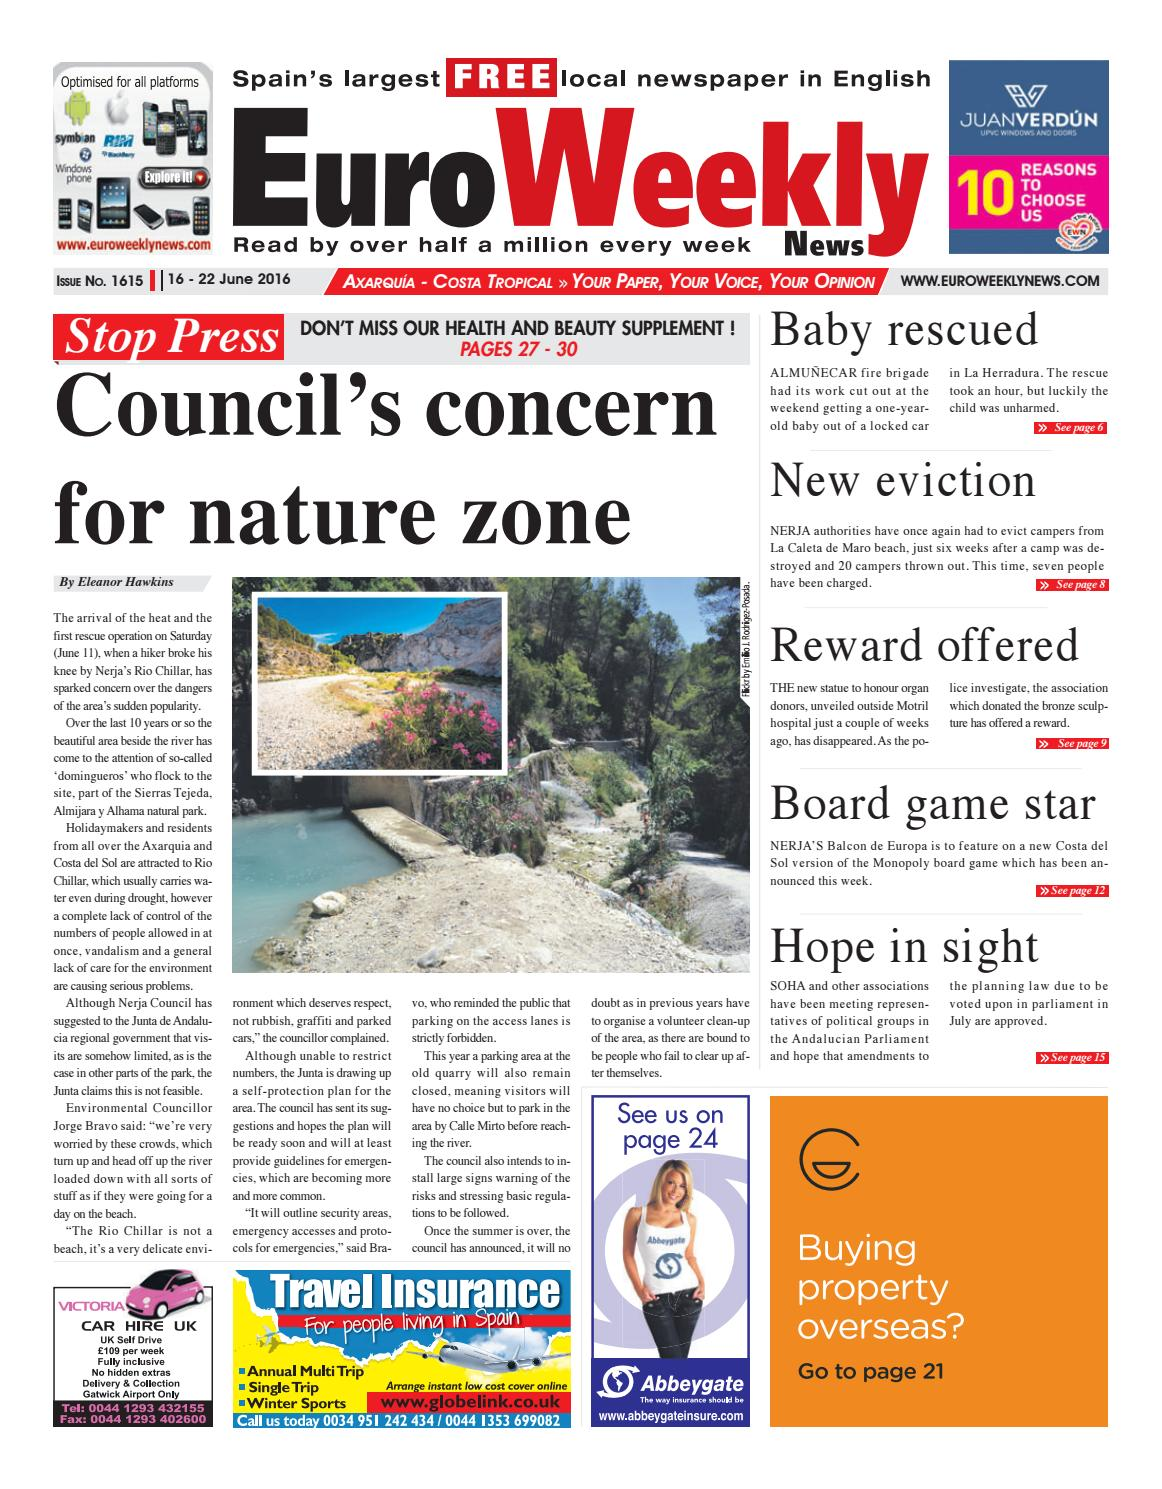 Euro Weekly News Axarquia 16 22 June 2016 Issue 1615 By Osage Warrior Ambulance Wiring Diagram Media Sa Issuu